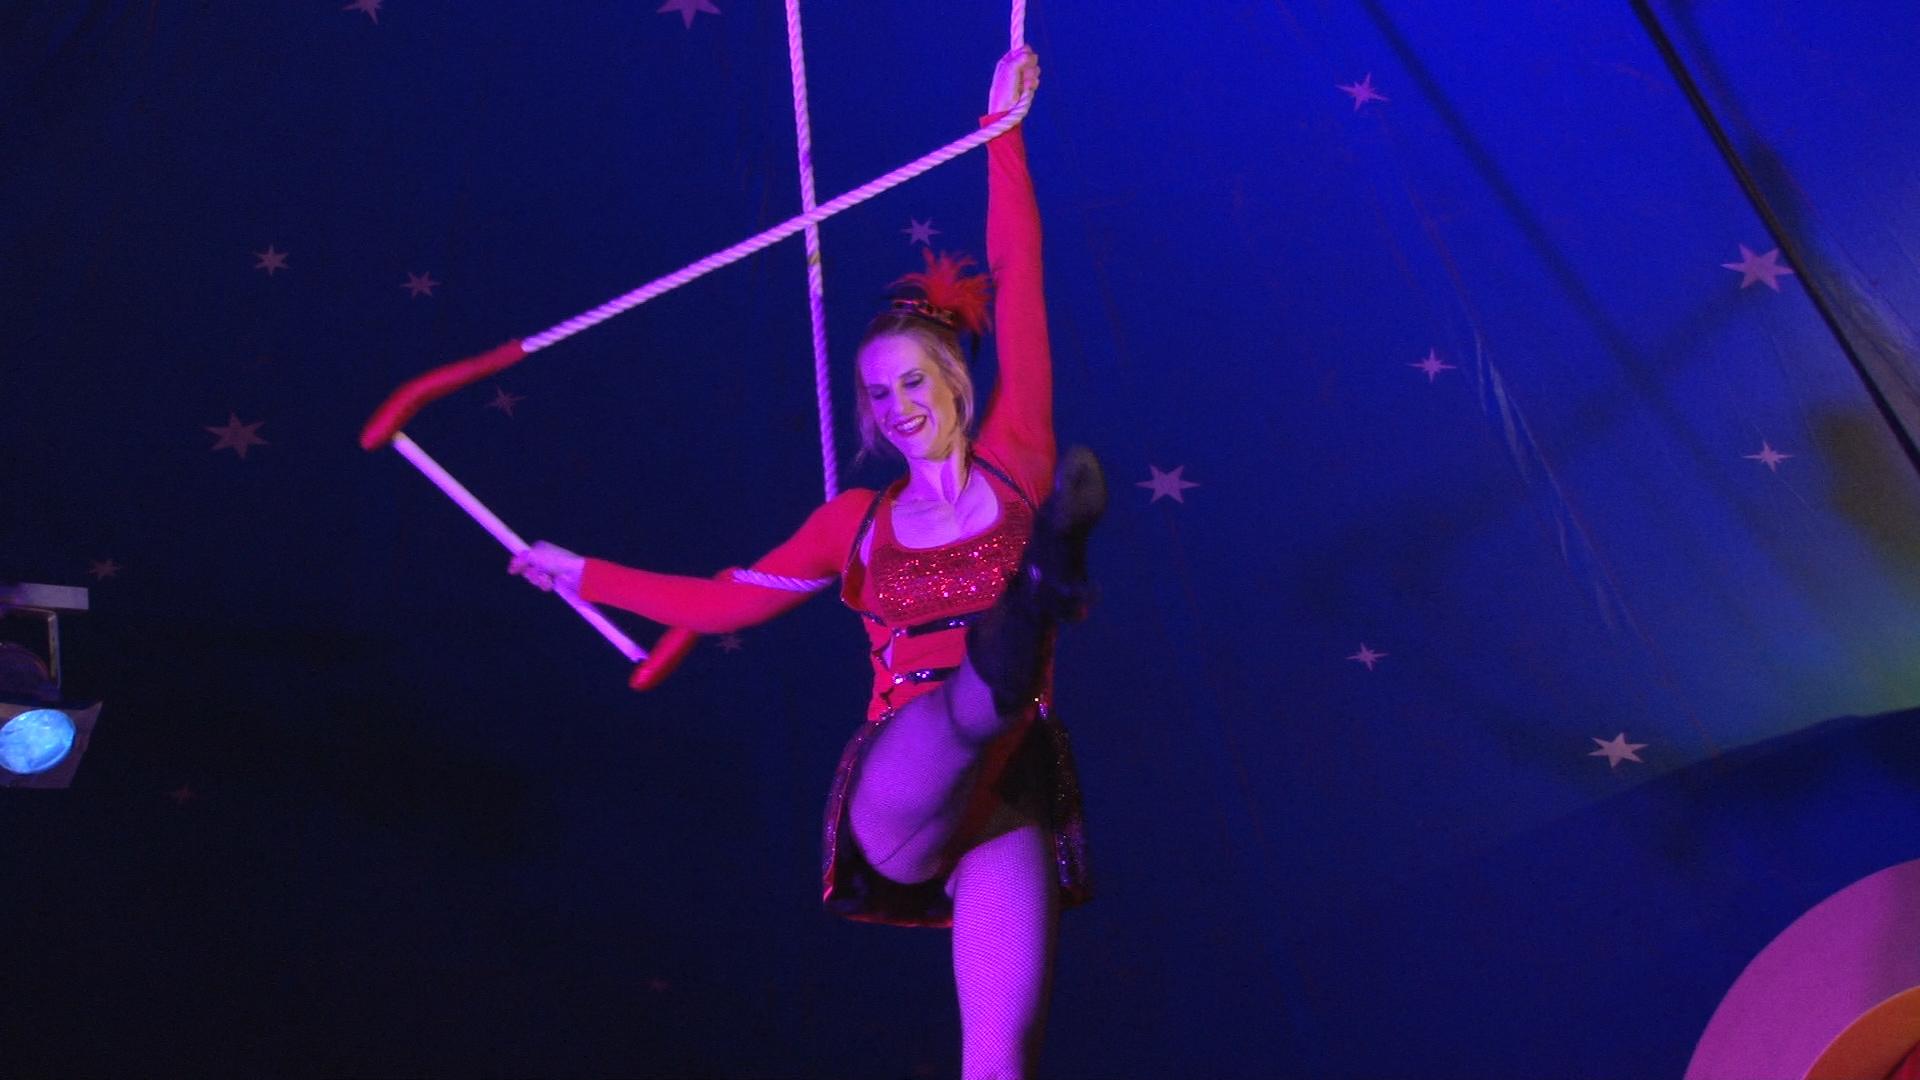 Laura-Cohen-Trapez-Show-circusevents-koeln-1